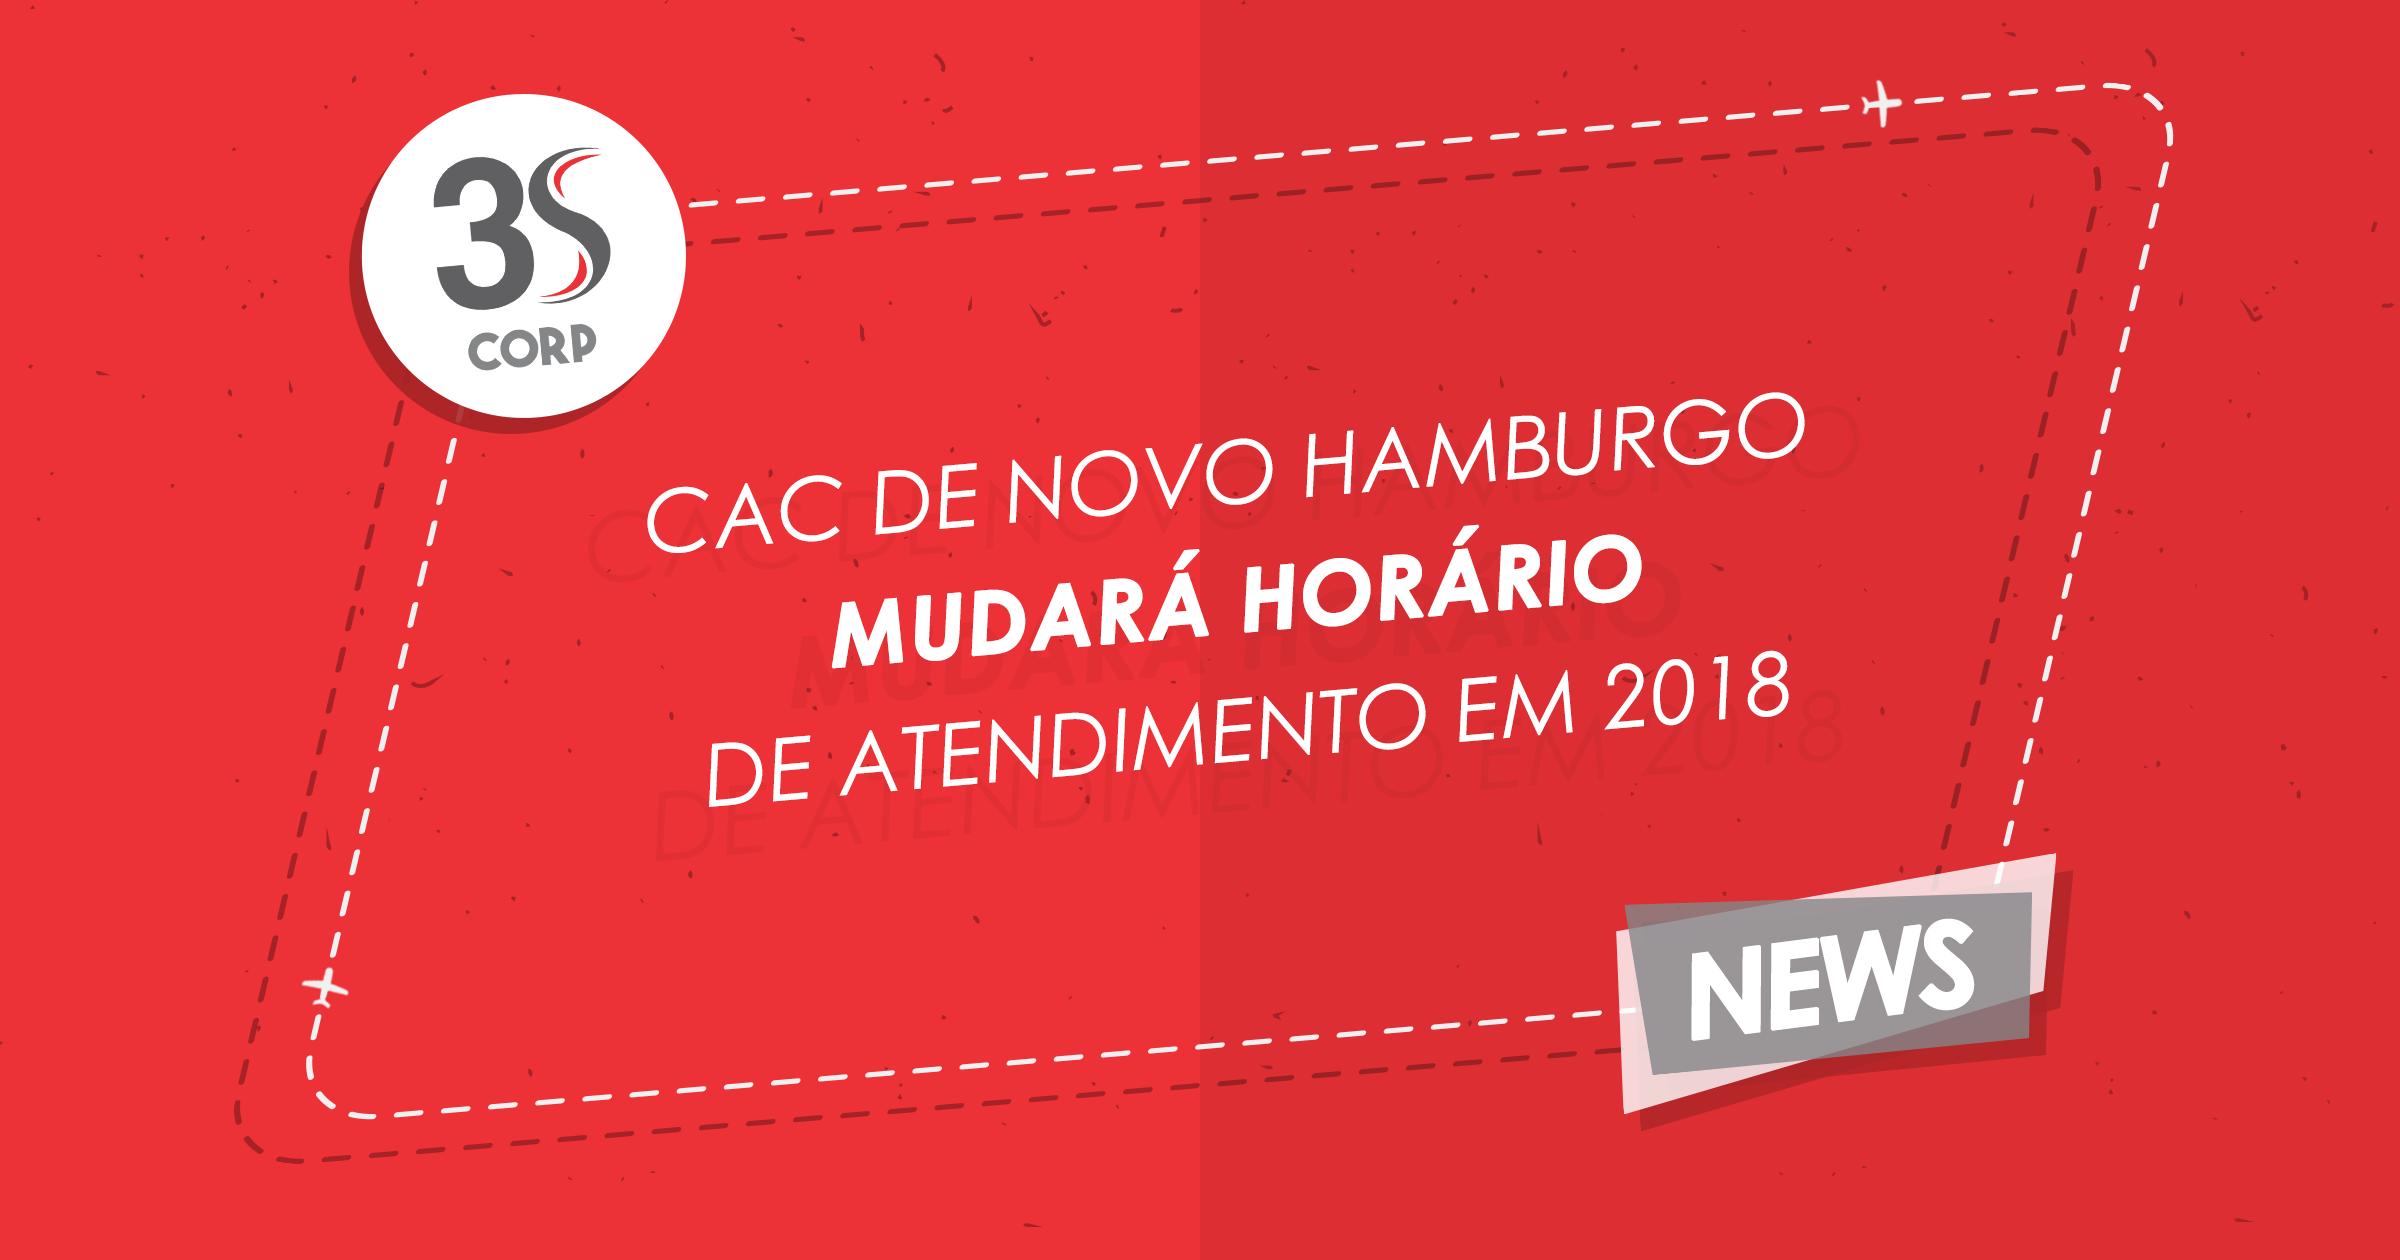 cac news